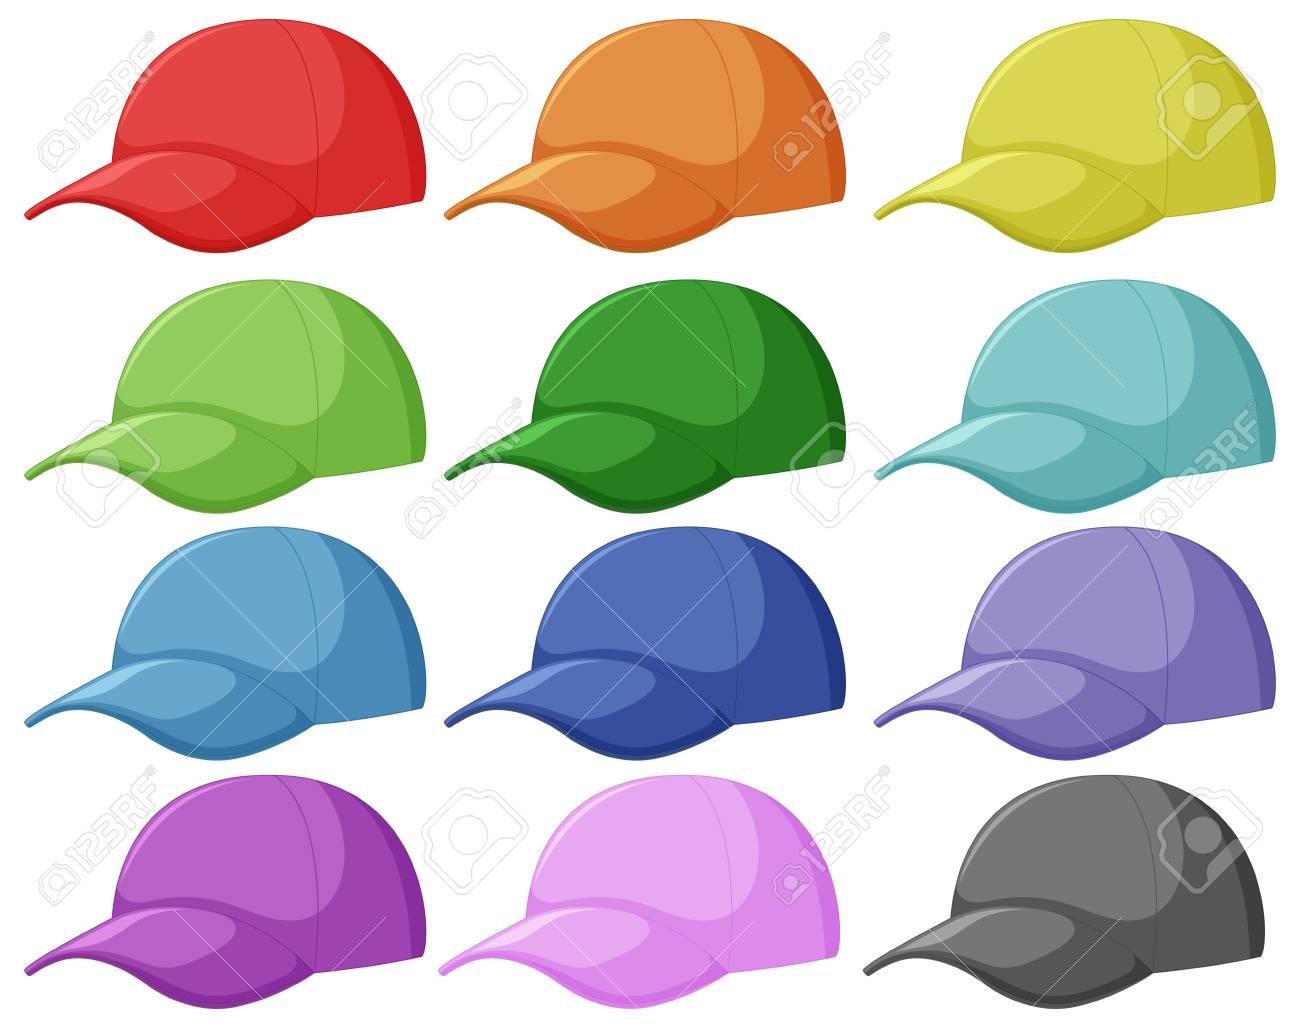 Set of different cap illustration - 123562975